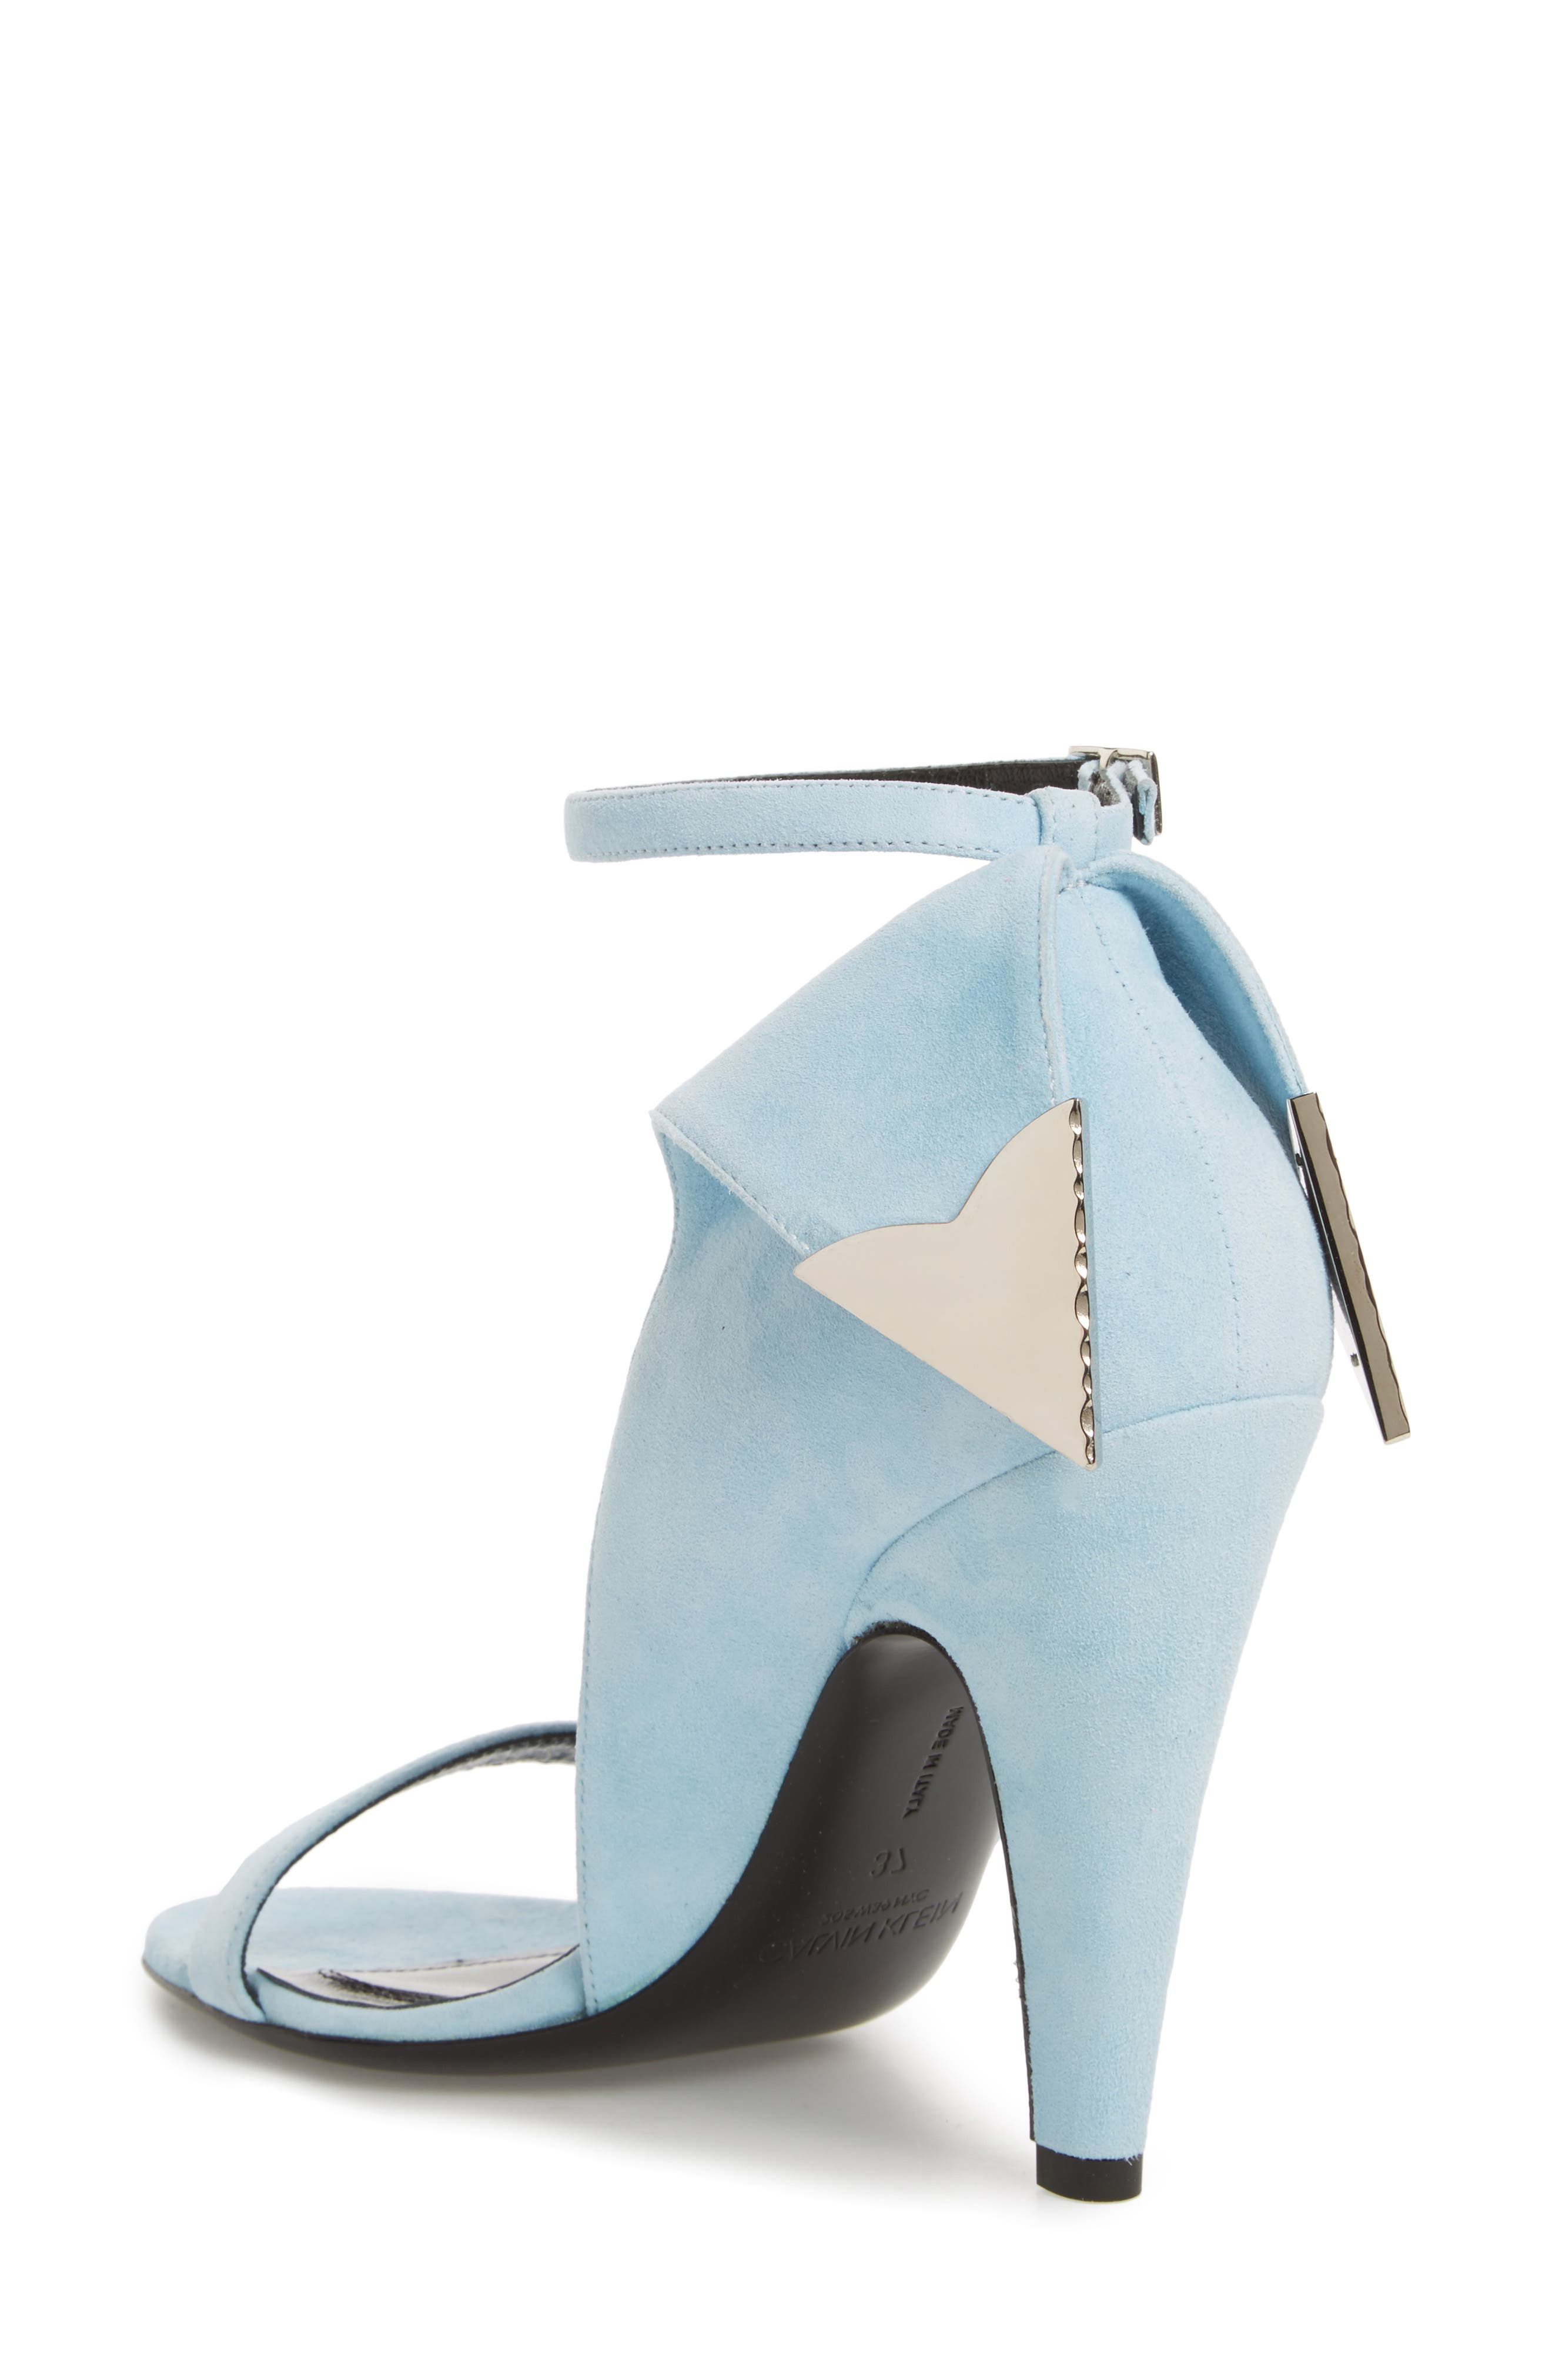 Leititia Ankle Strap Sandal,                             Alternate thumbnail 2, color,                             400